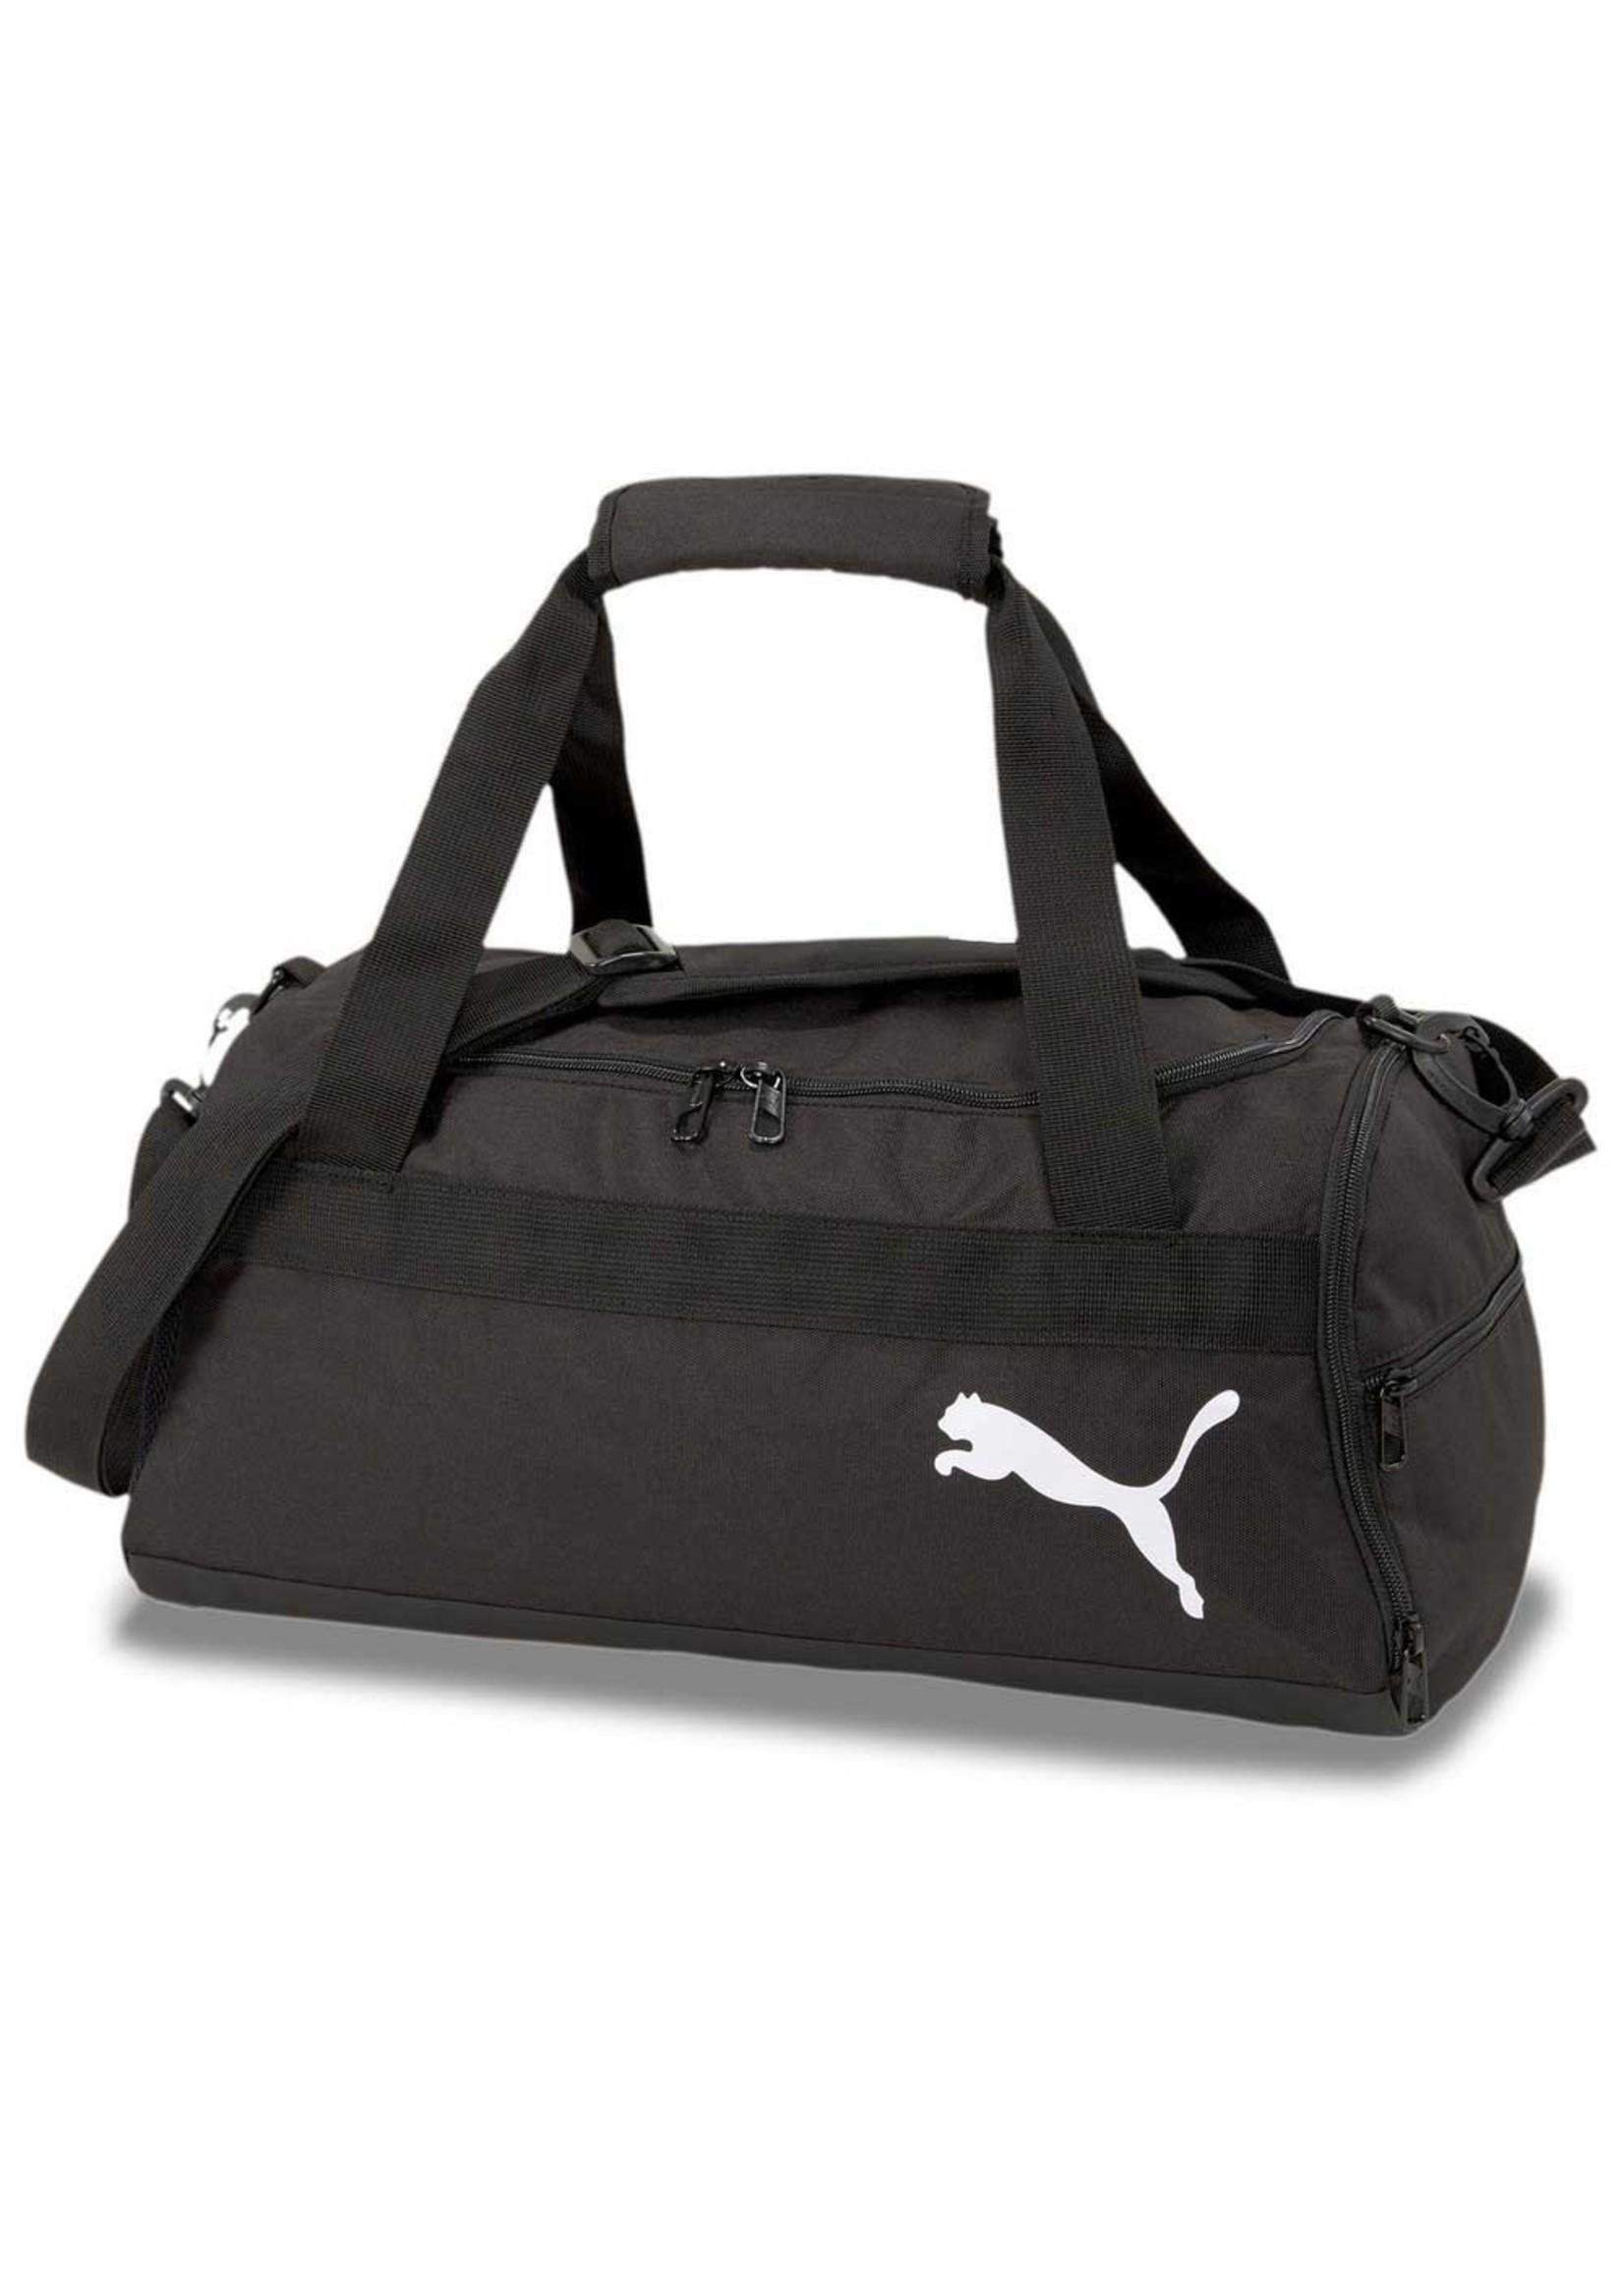 Puma PUMA TEAMGOAL BAG